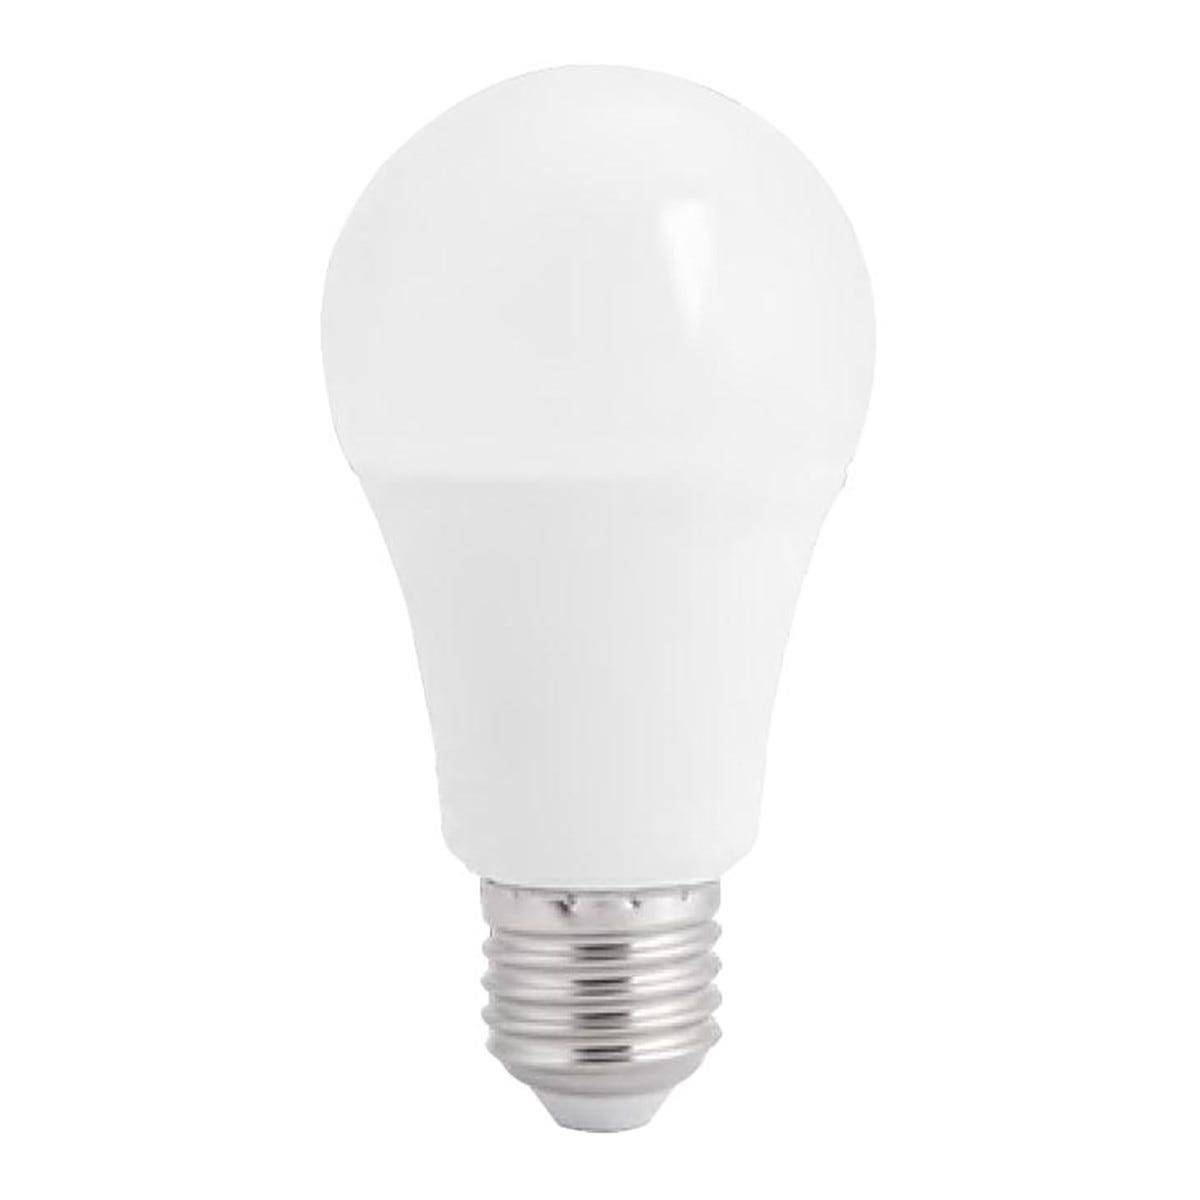 parko 3 lampadine  led goccia 11w e27 1050 lumen 4000k luce bianca